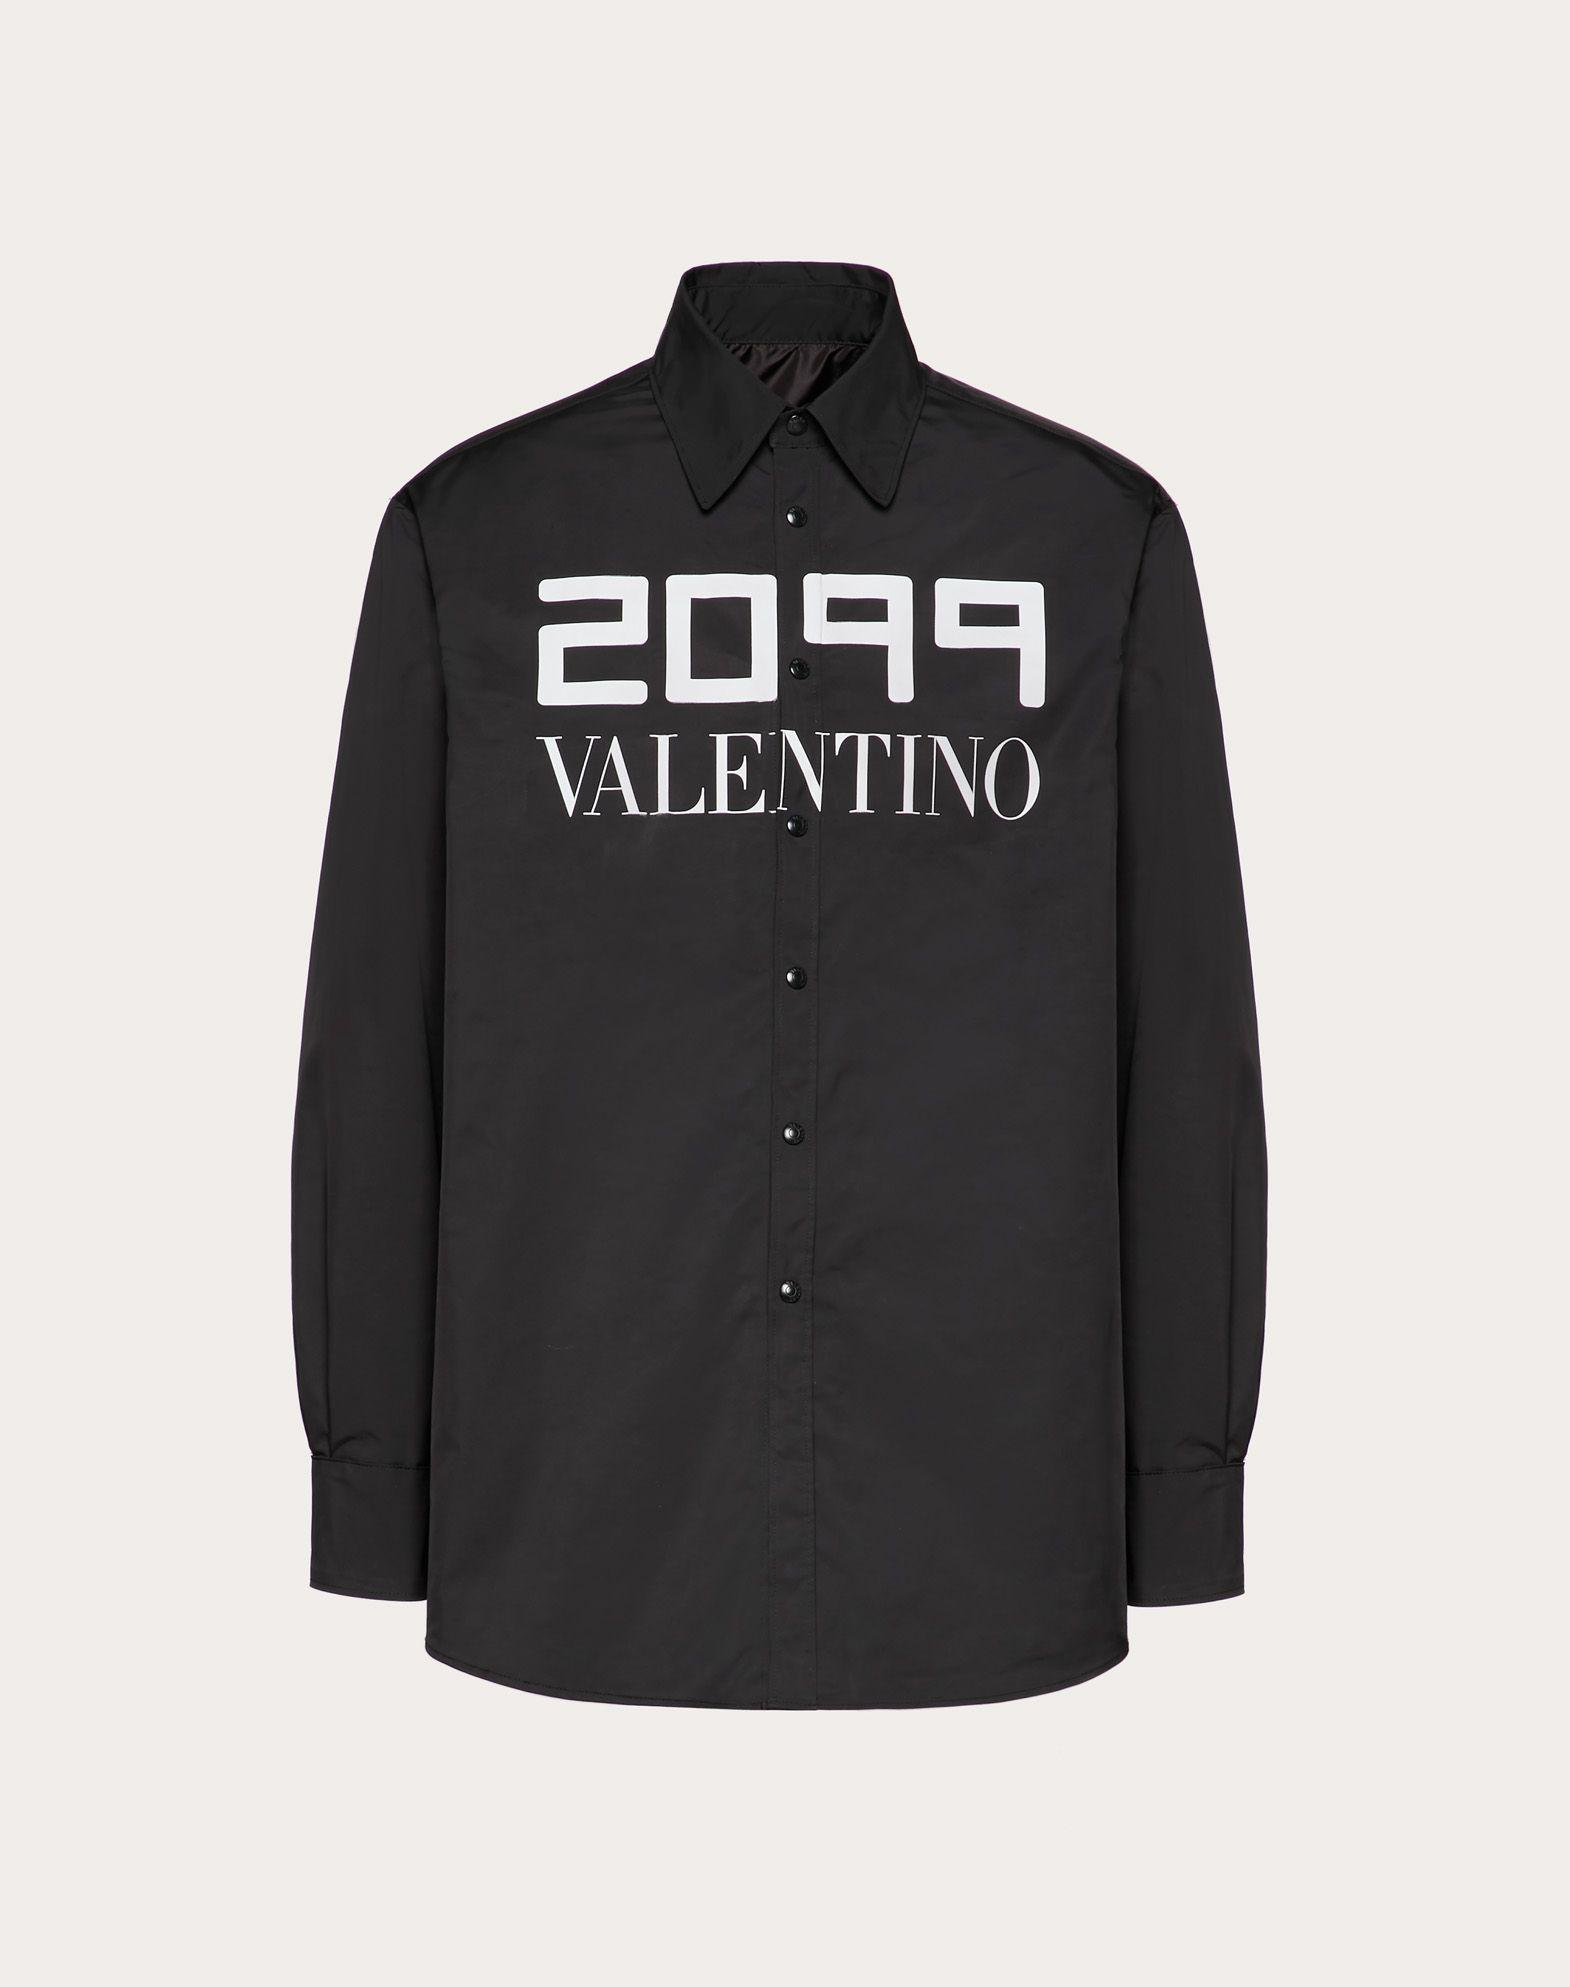 JACKET WITH 2099 VALENTINO PRINT